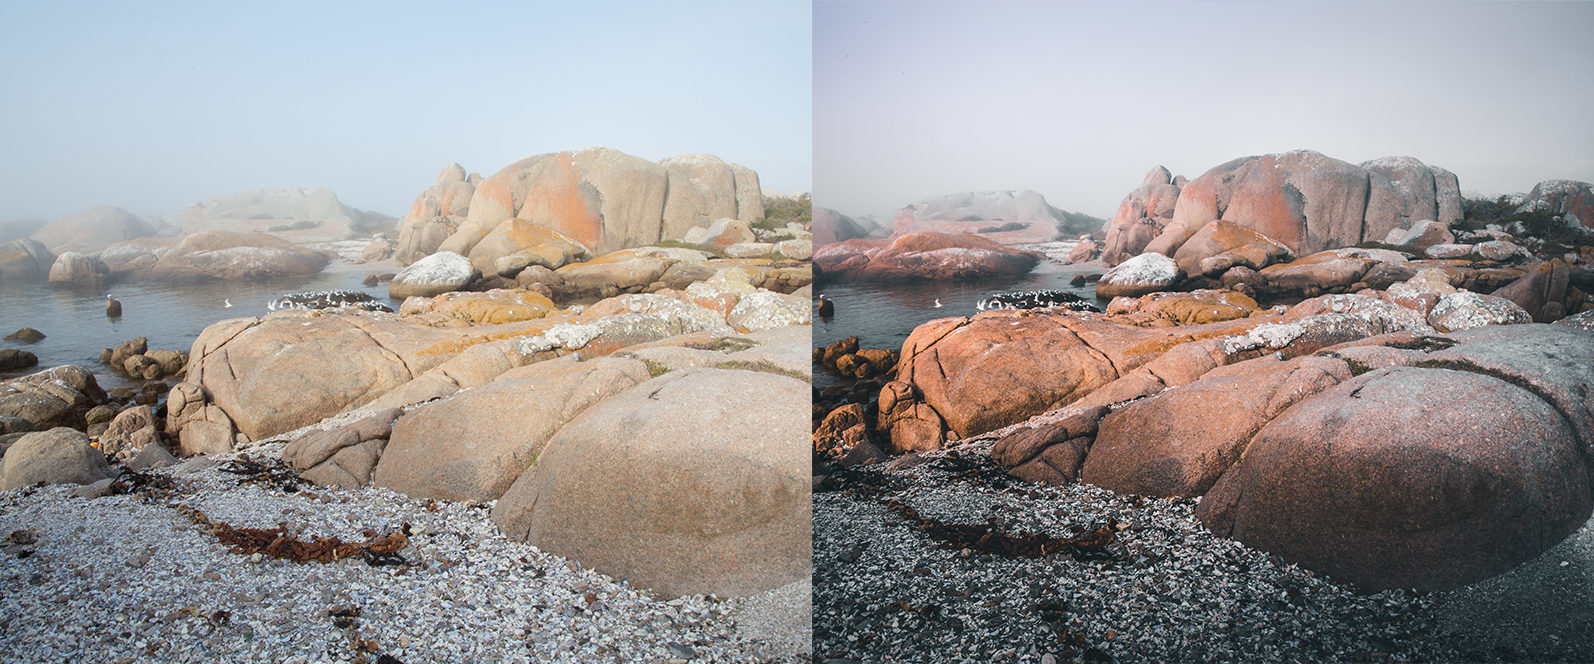 12 x Lightroom Presets, Cape Columbine, Beach and Ocean Presets, Seascape Presets - 9 Cape Columbine2 1 -